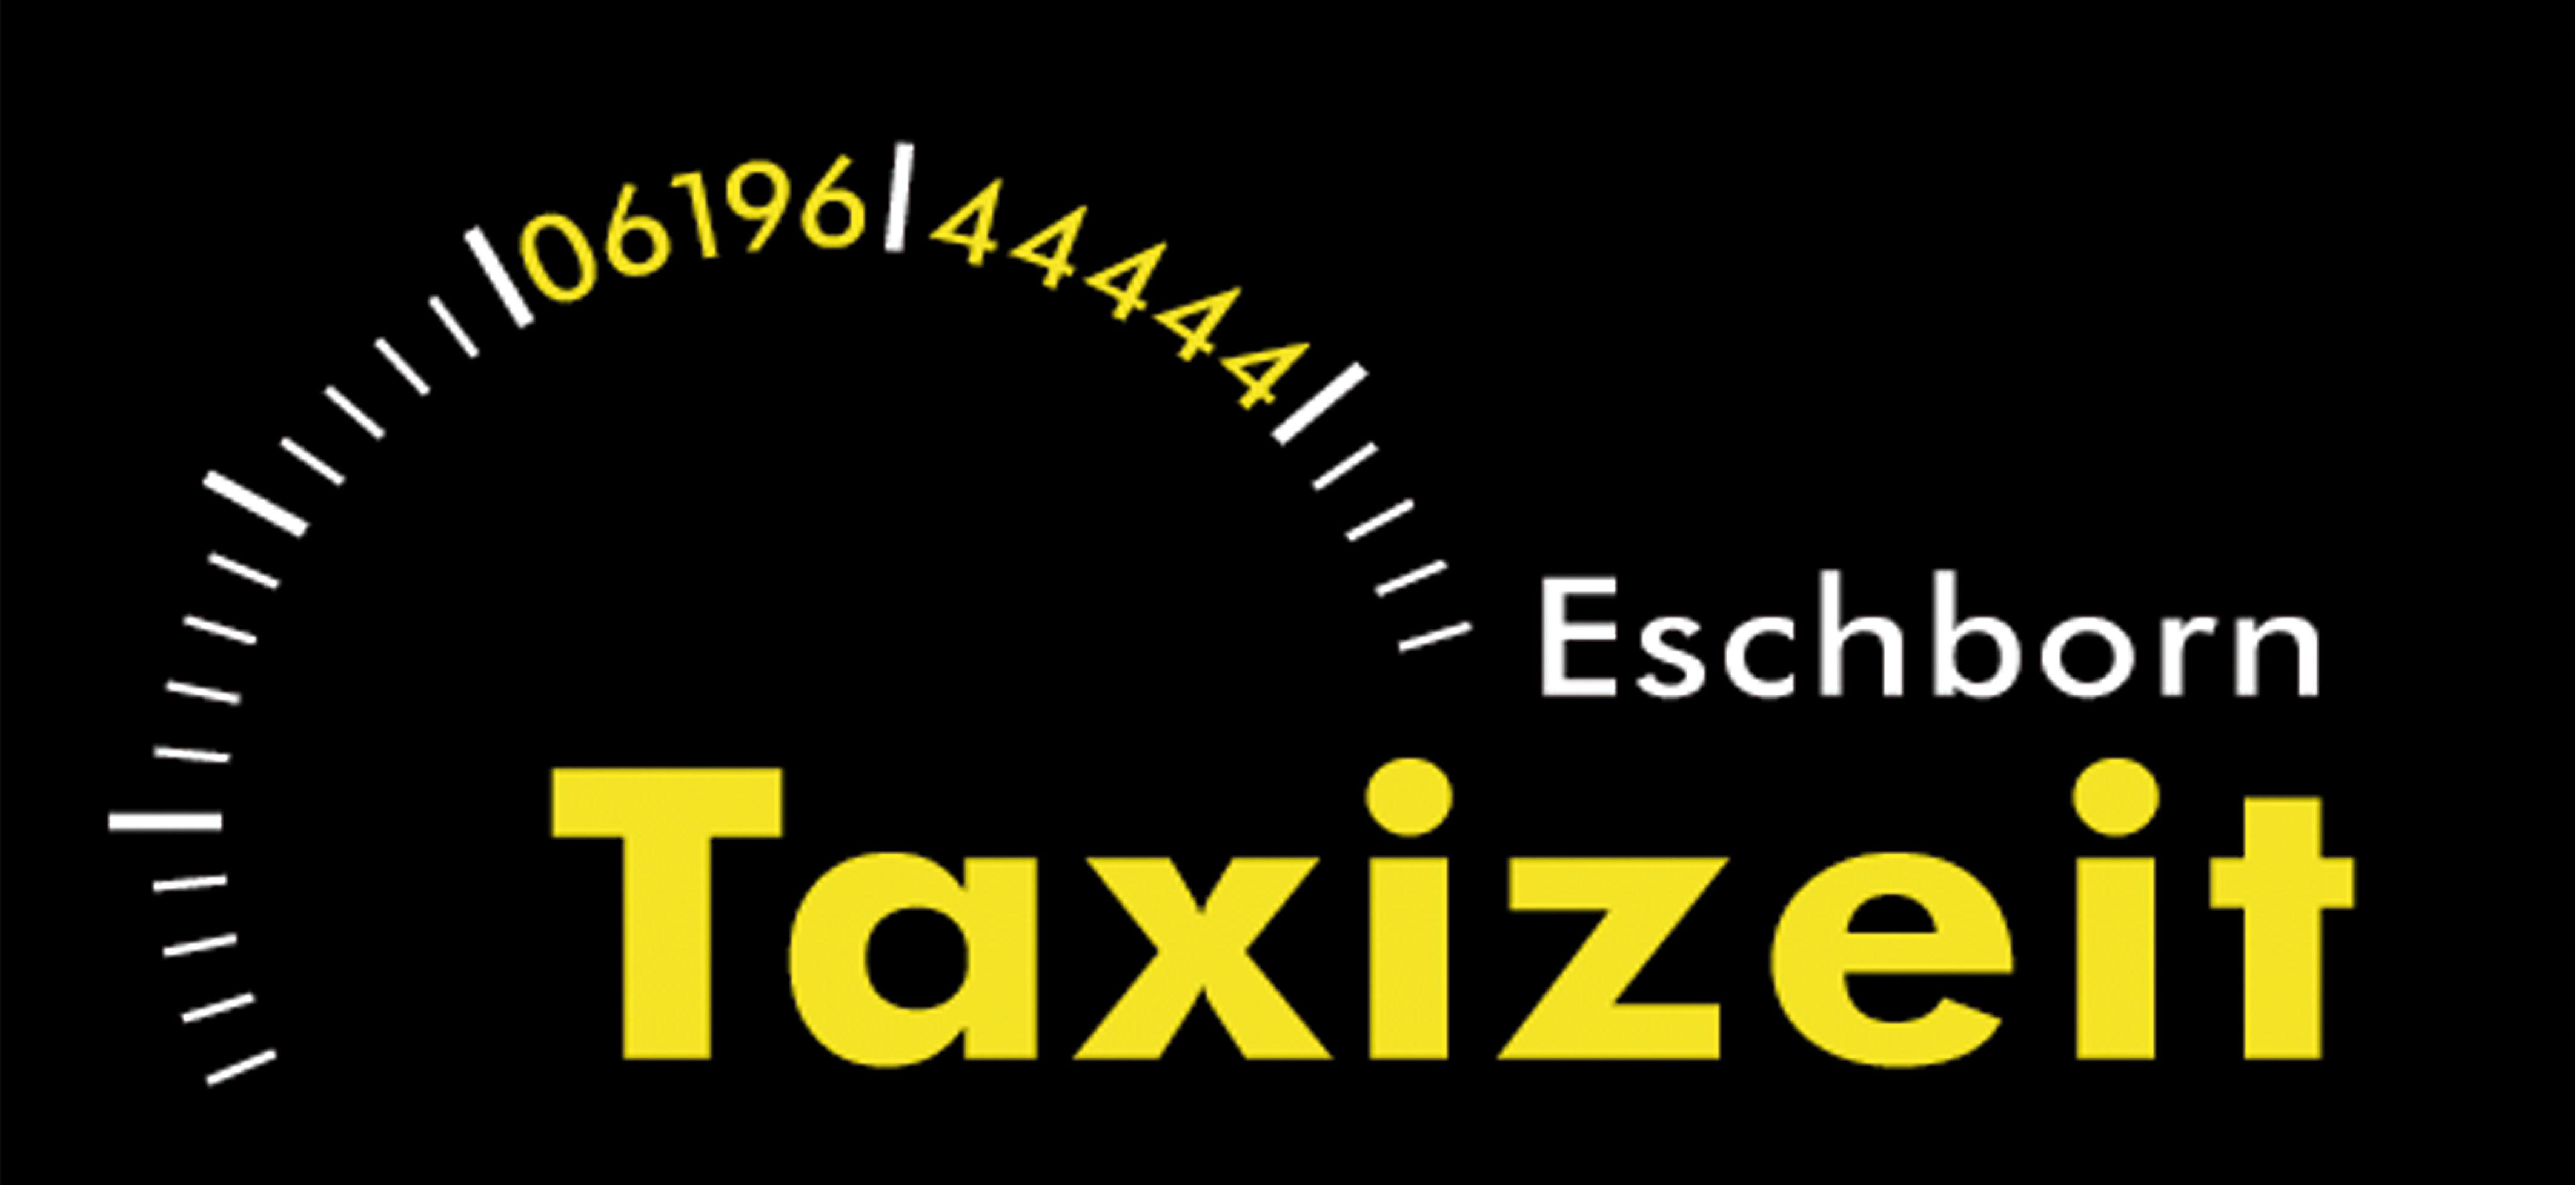 Taxizeit Eschborn GmbH